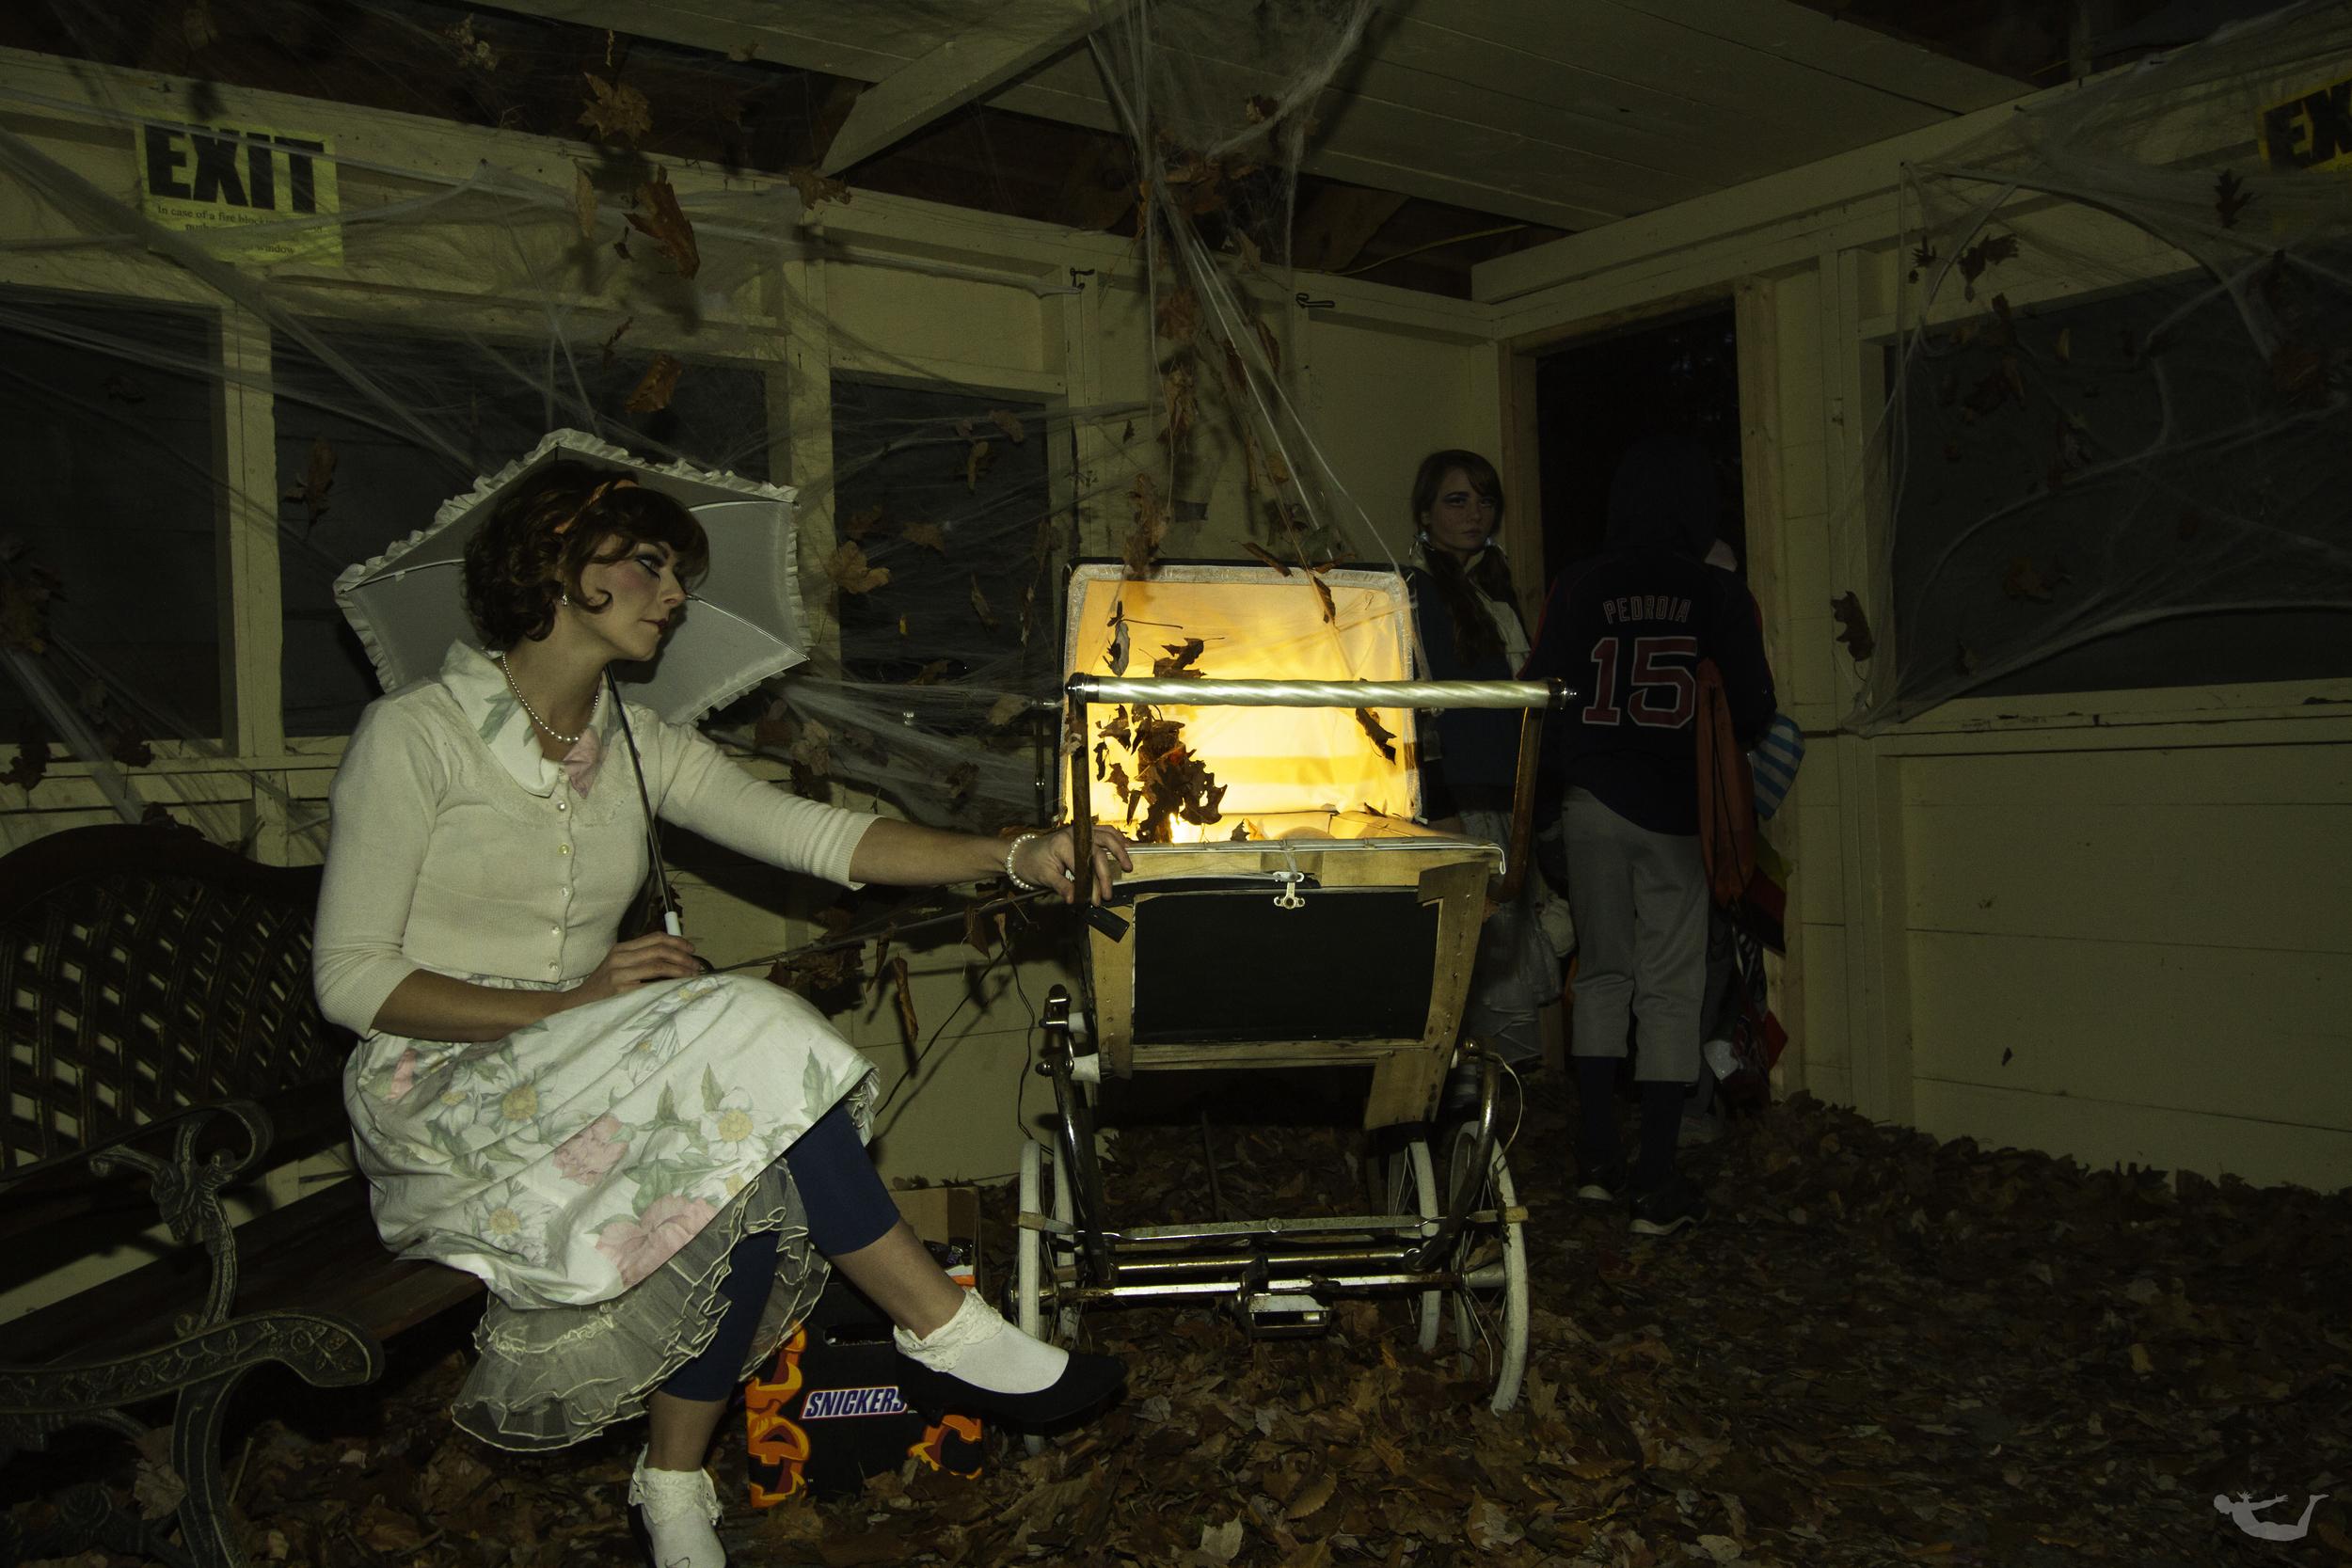 Spooky Halloween Cabins.jpg